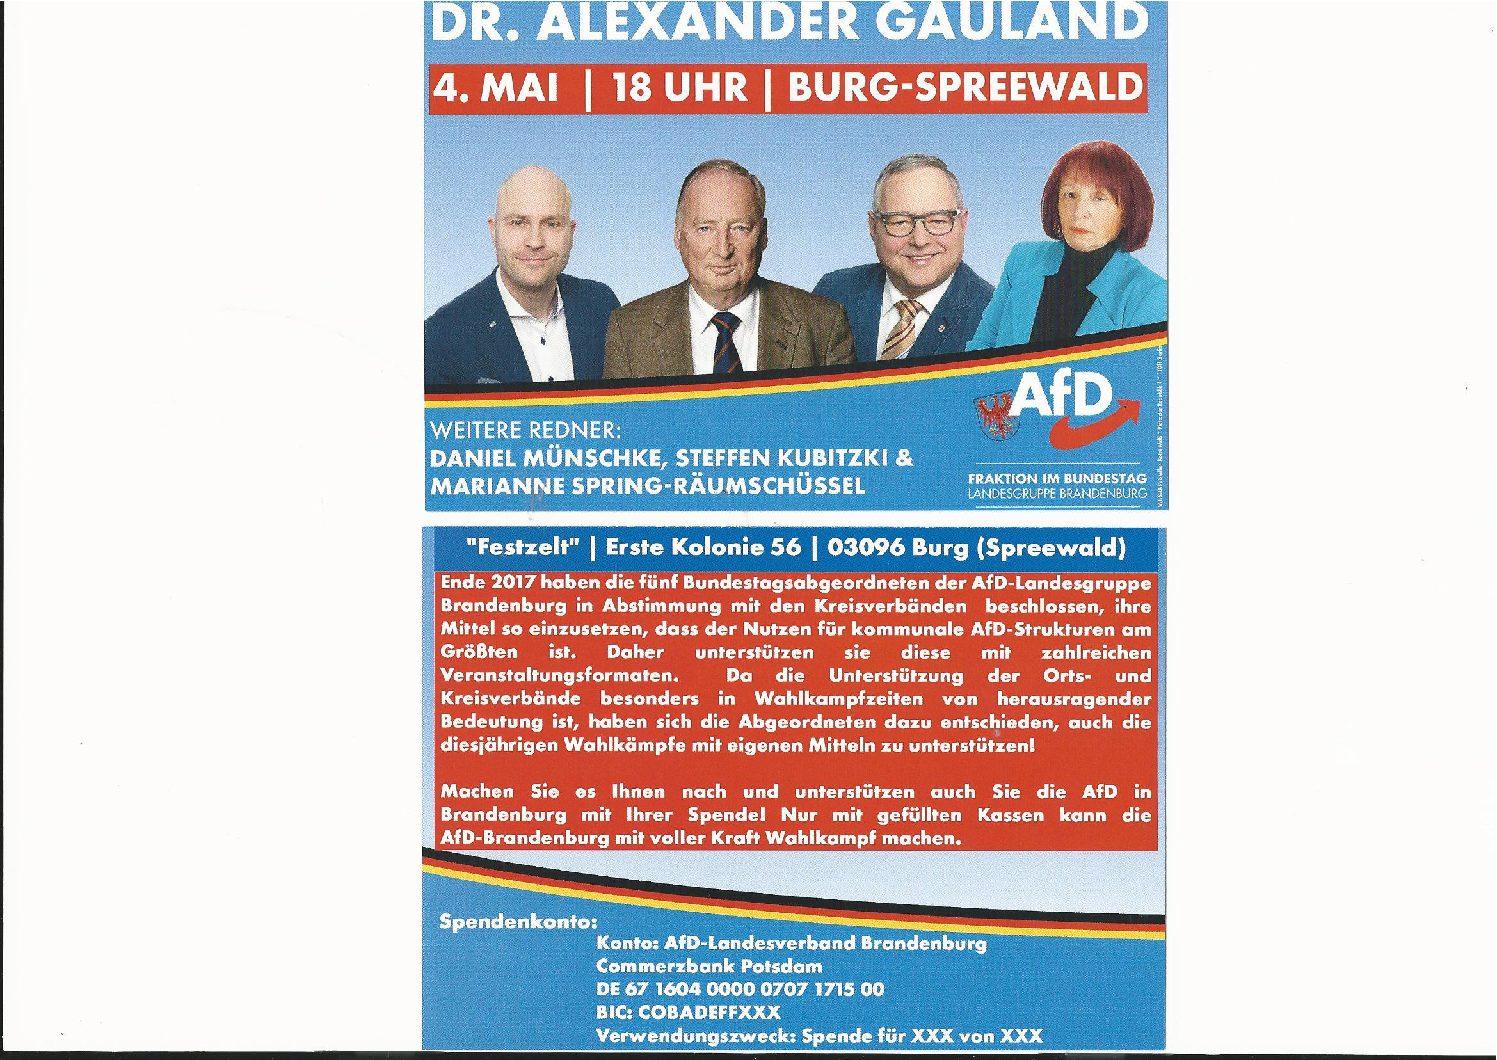 Wahlkampfveranstaltung in Burg